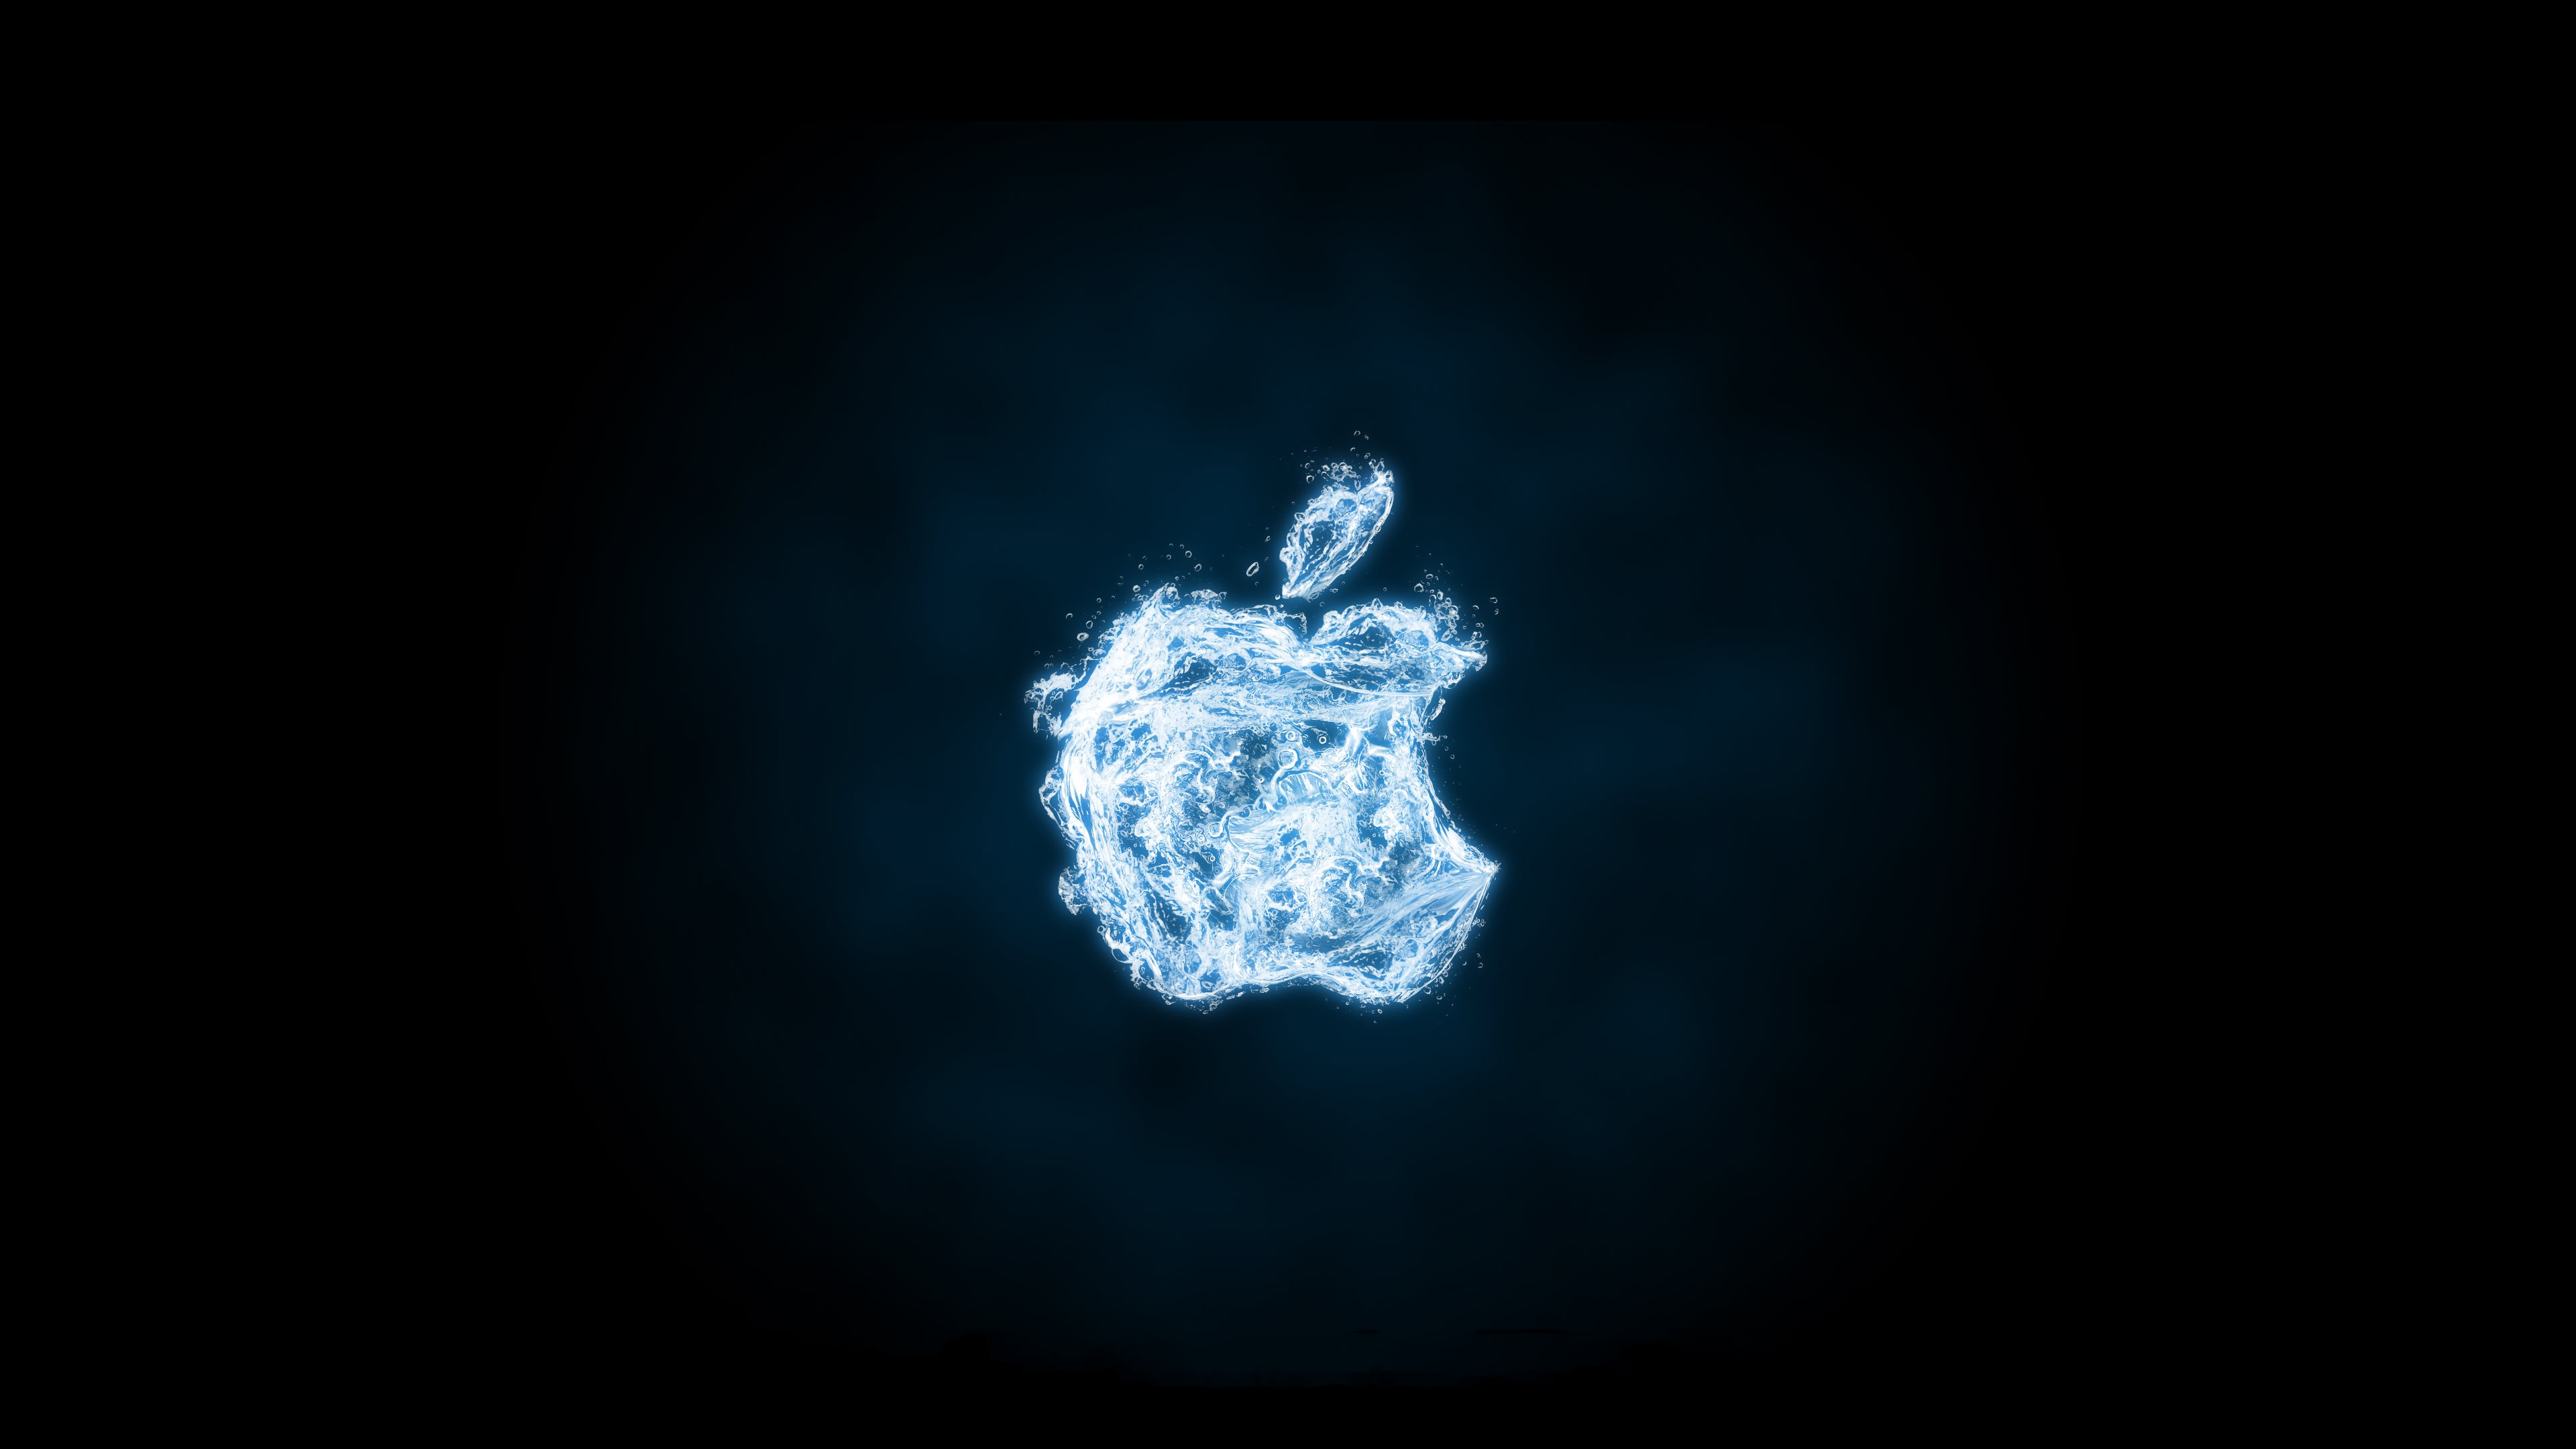 Wallpaper: Apple Water